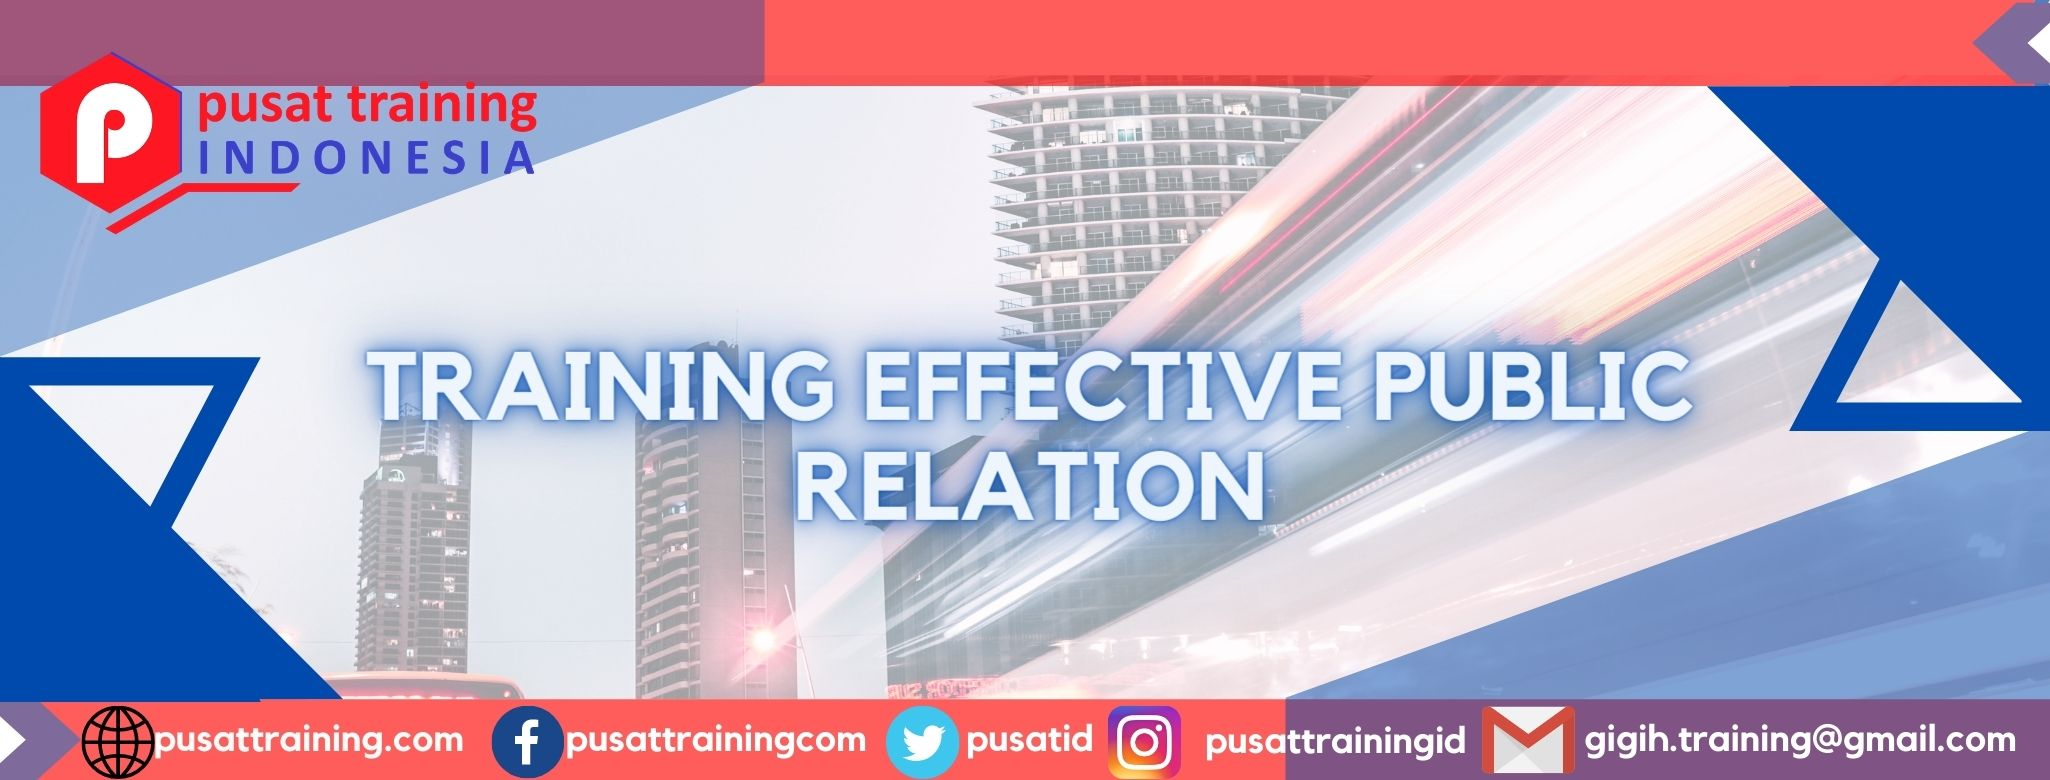 TRAINING EFFECTIVE PUBLIC RELATION